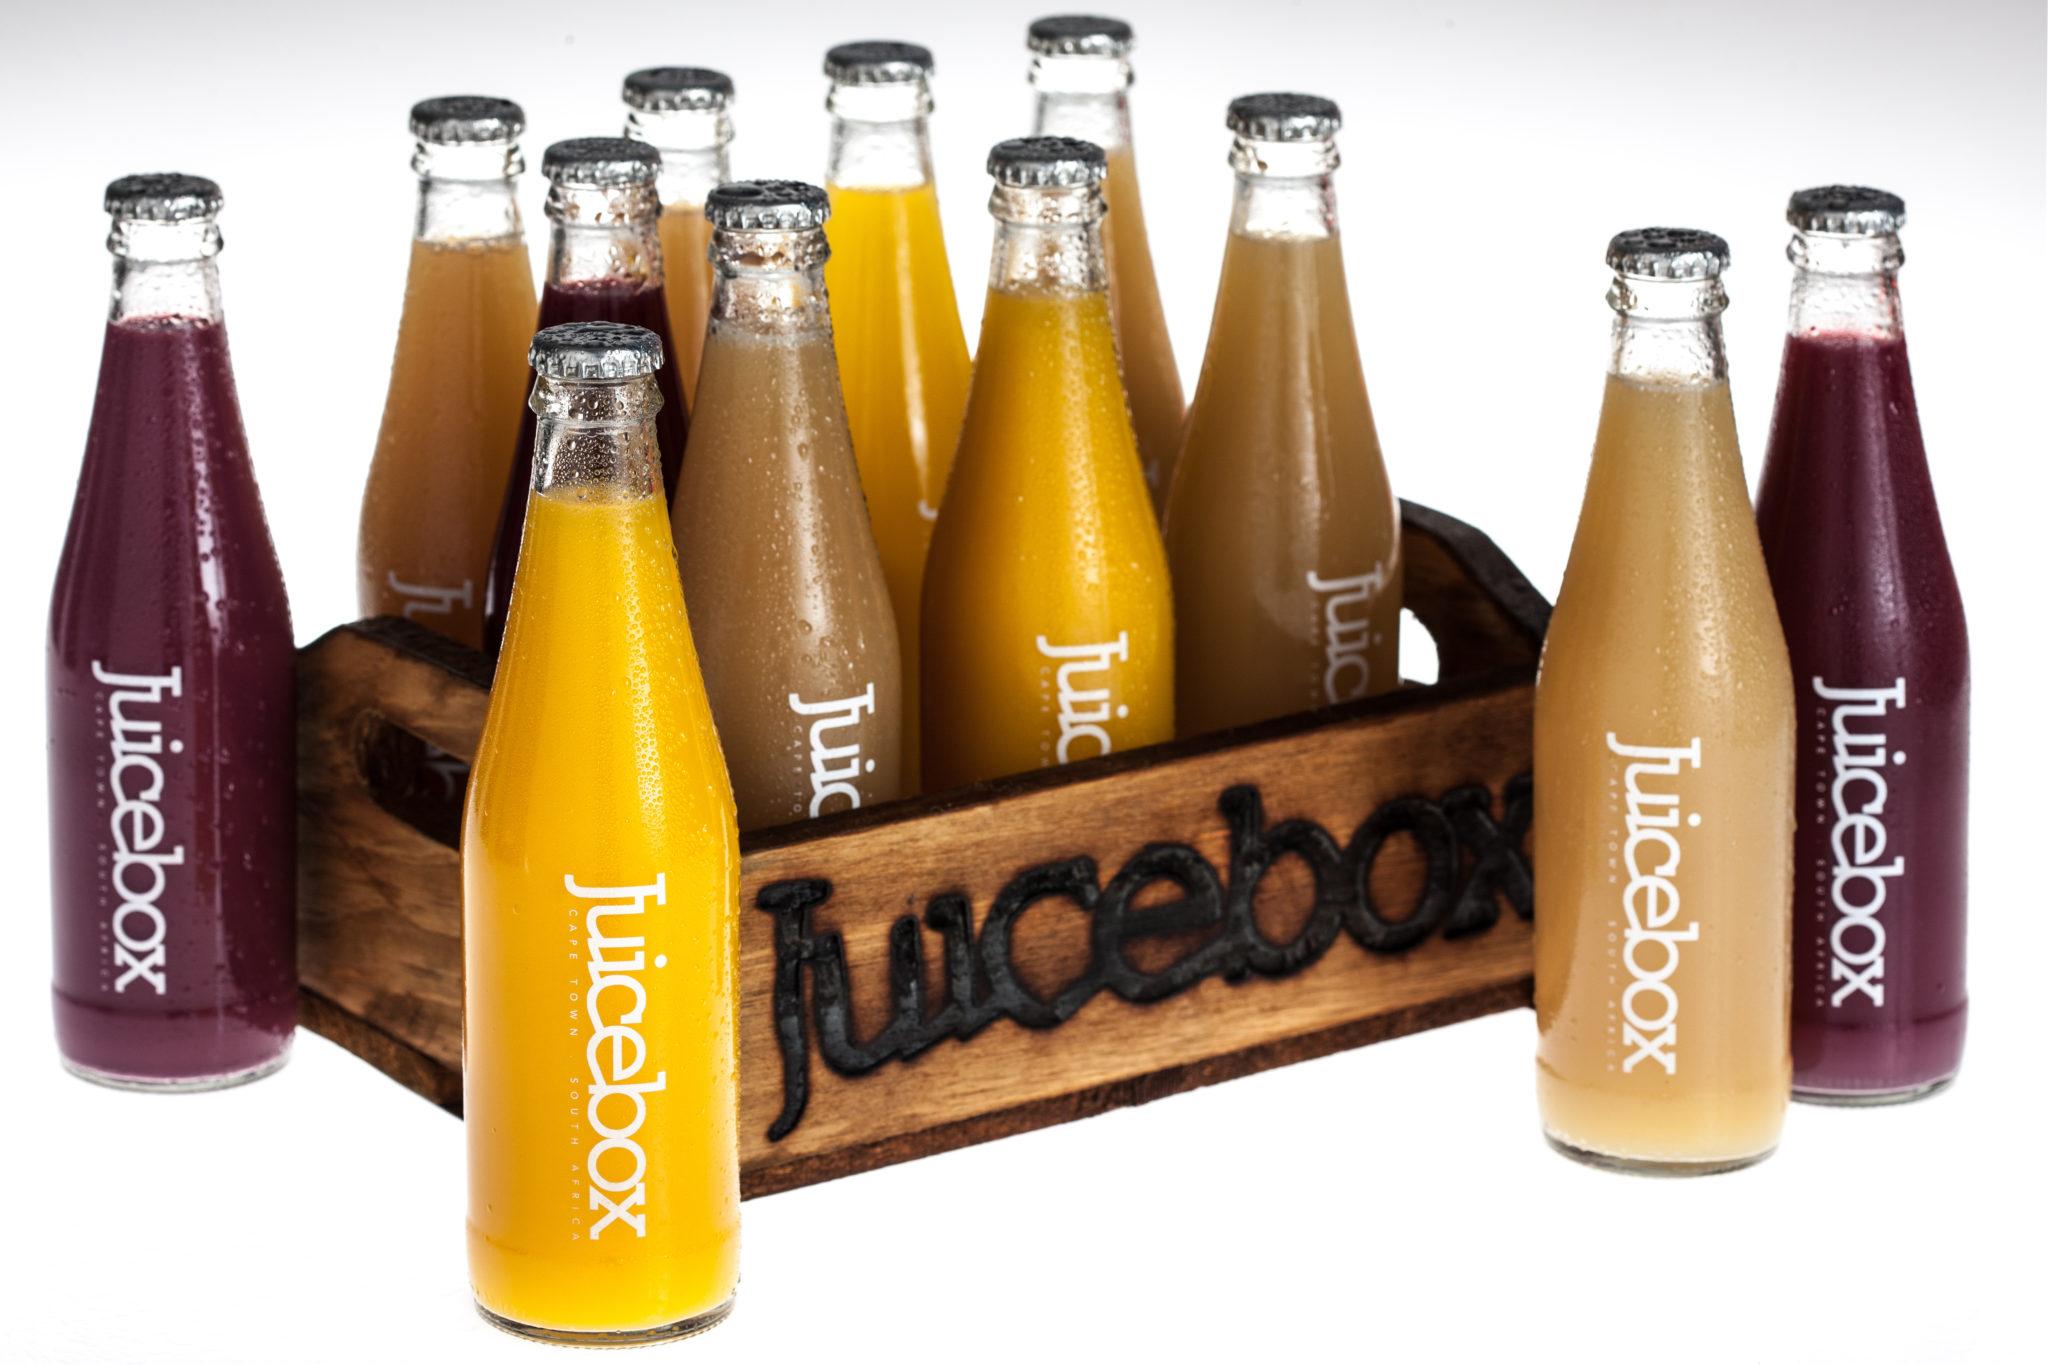 Juicebox (45 of 1)